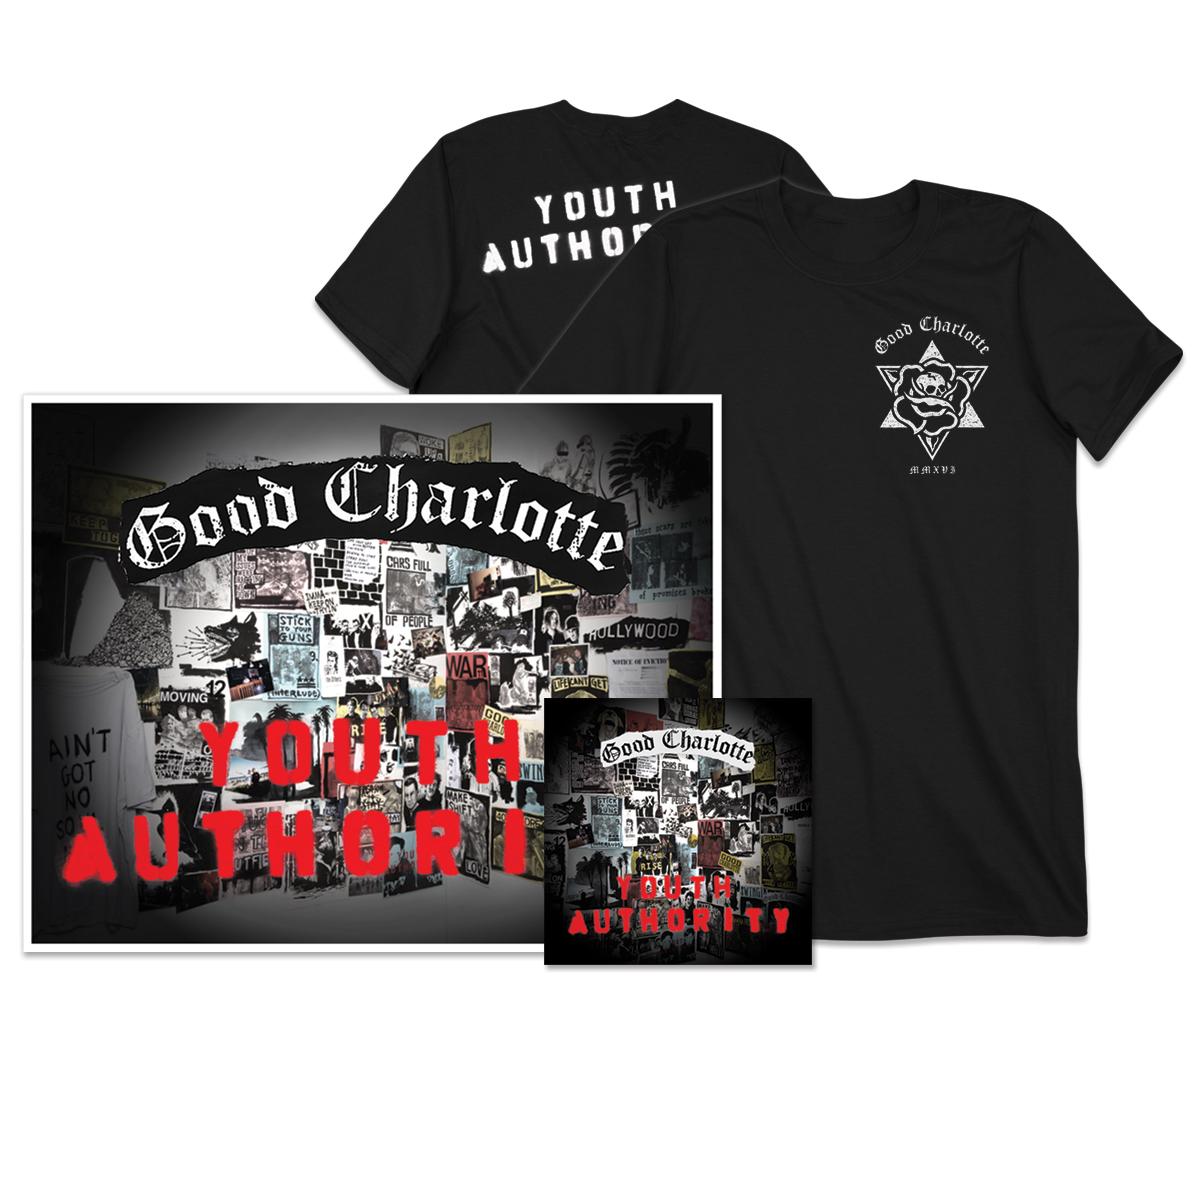 Youth Authority CD + Signed Litho + T-shirt